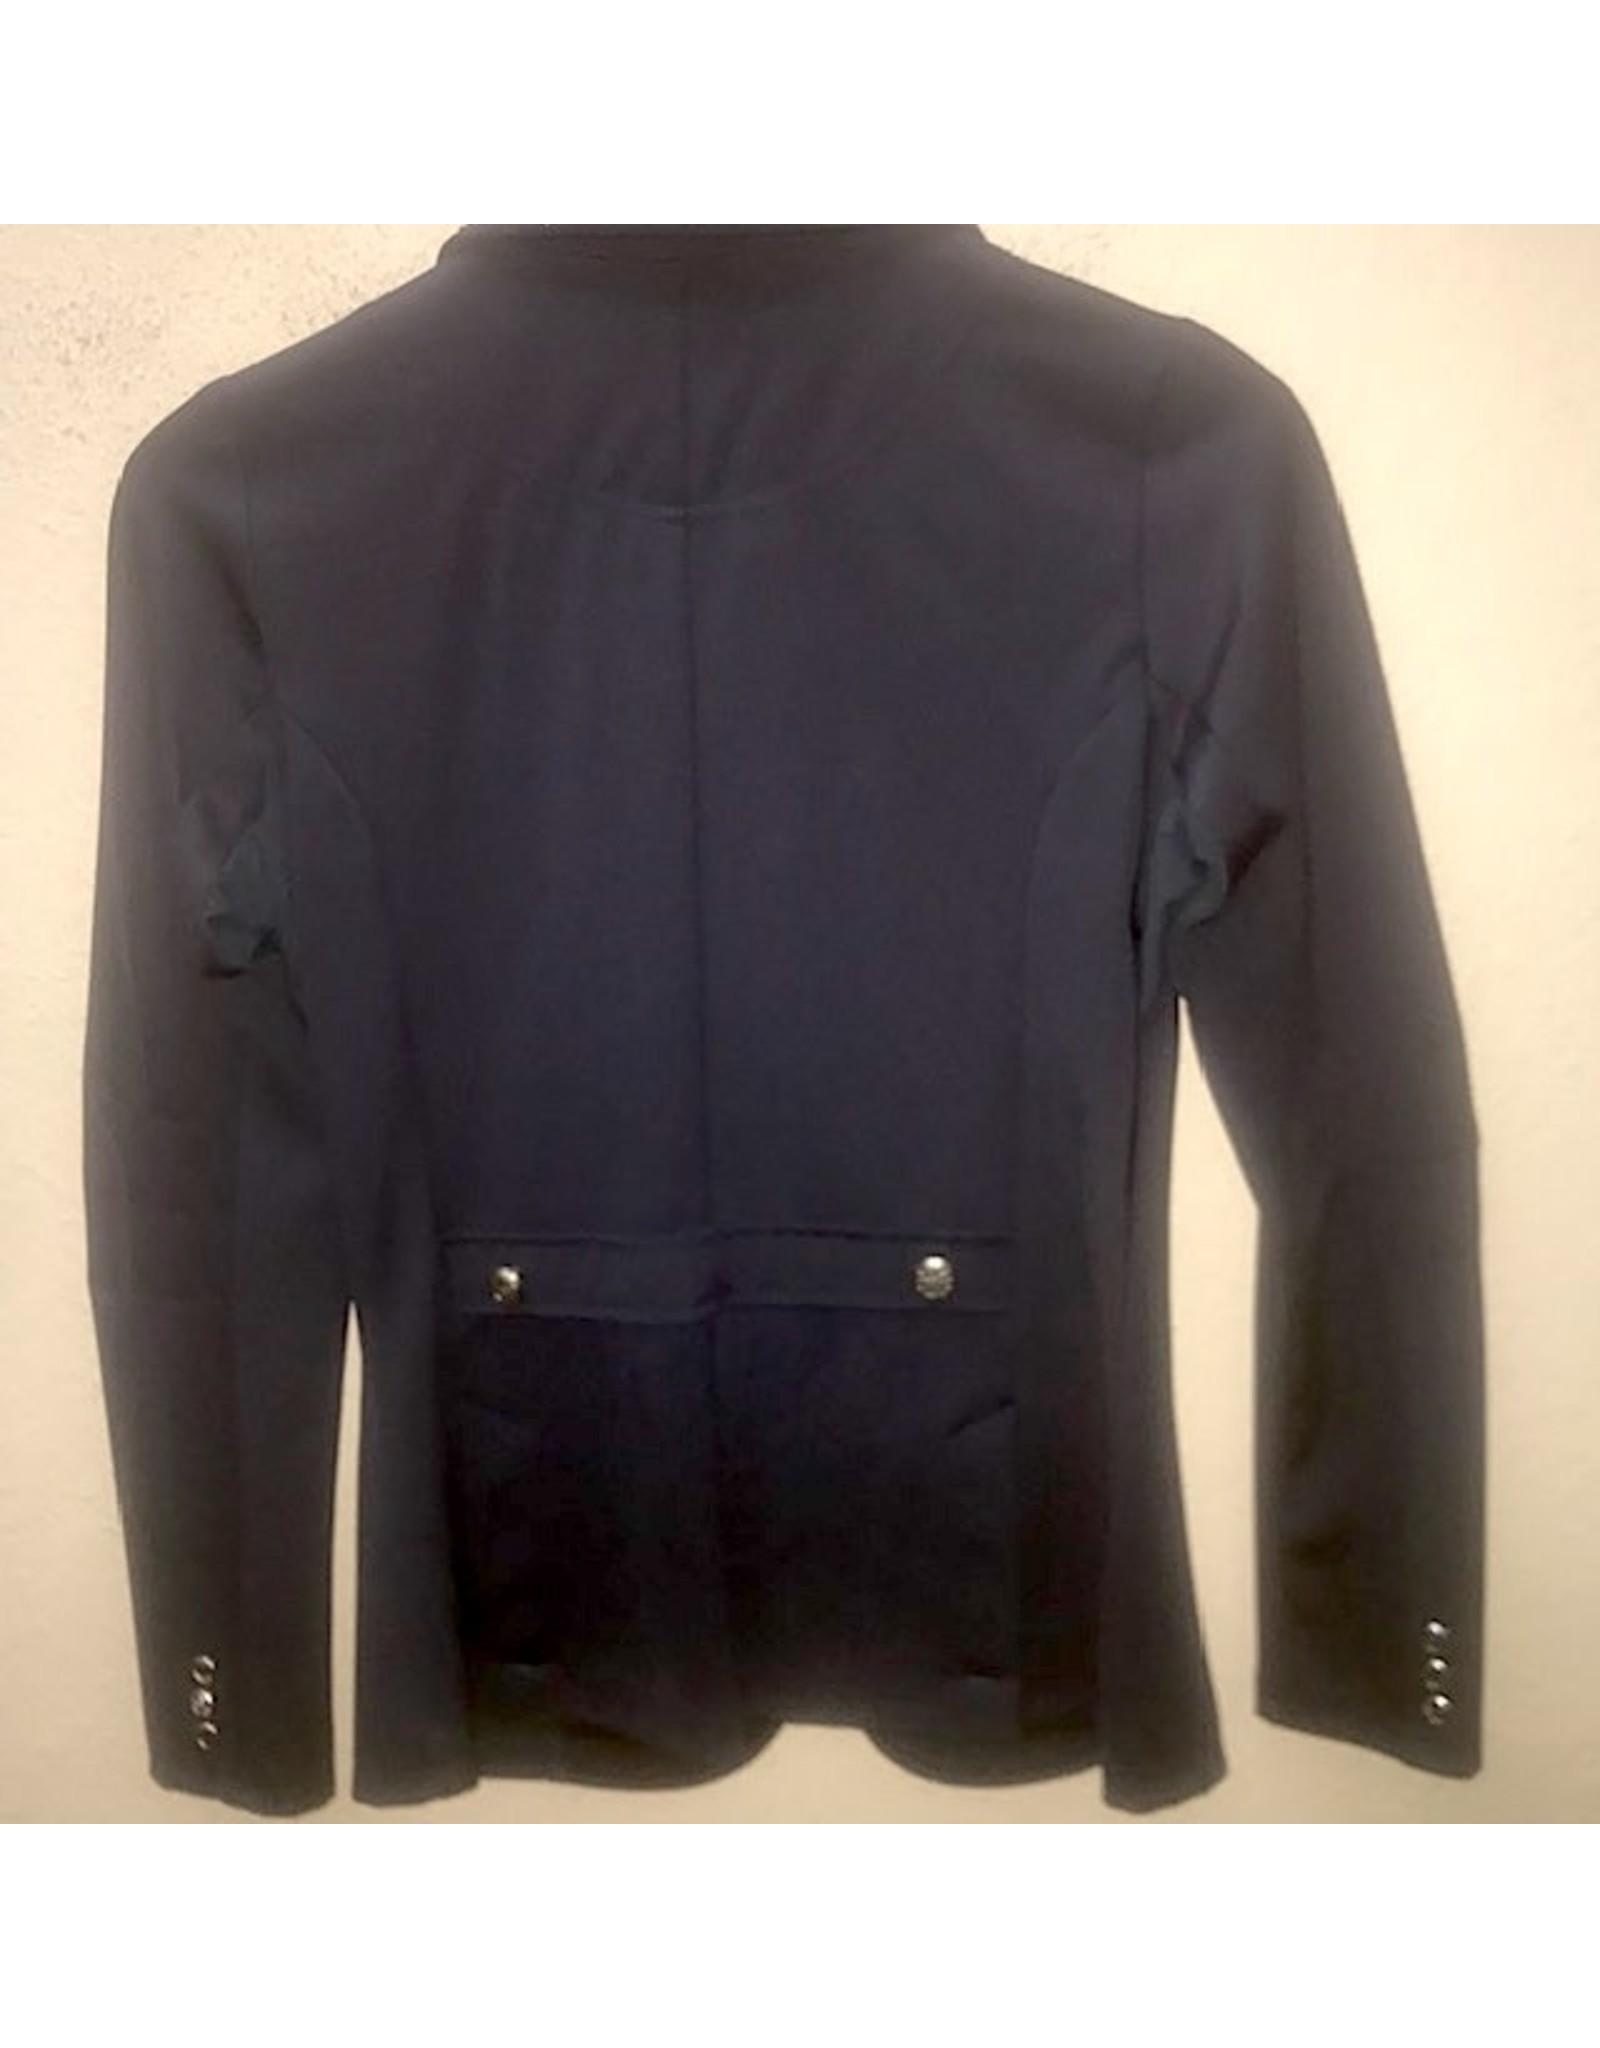 Romfh Navy Bling Coat Sz4